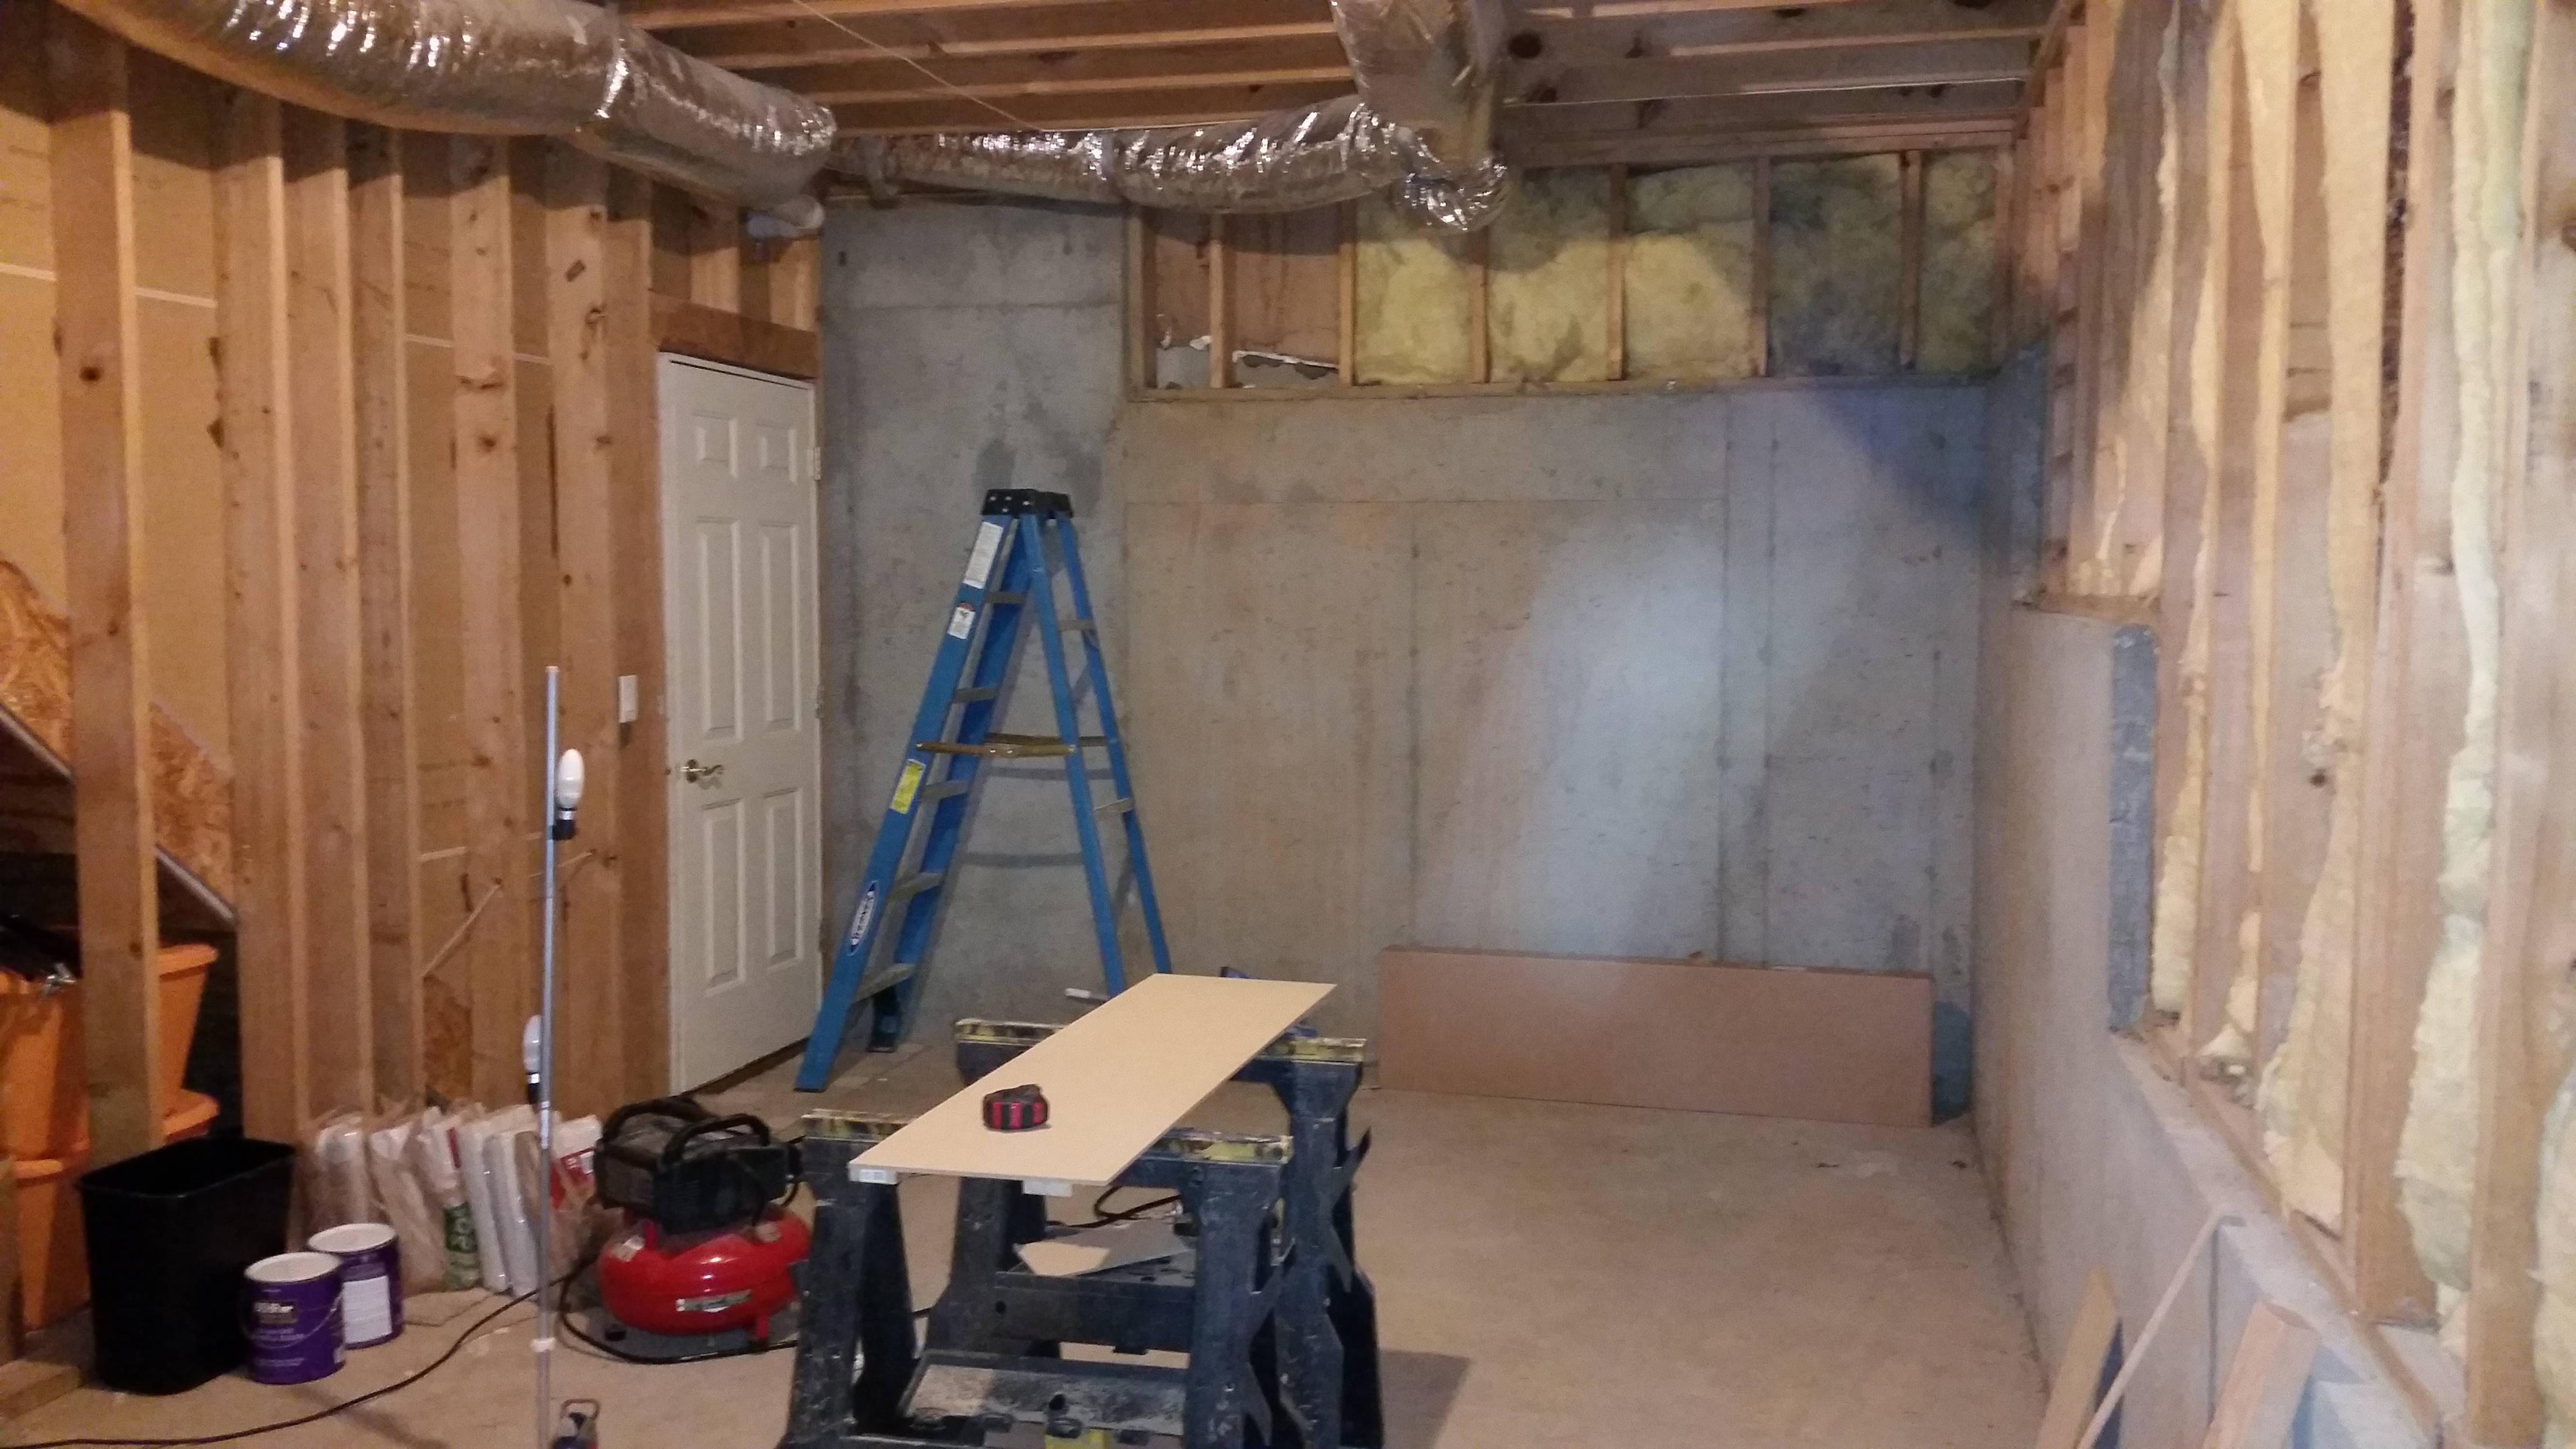 diy-basement-turned-into-gym-1